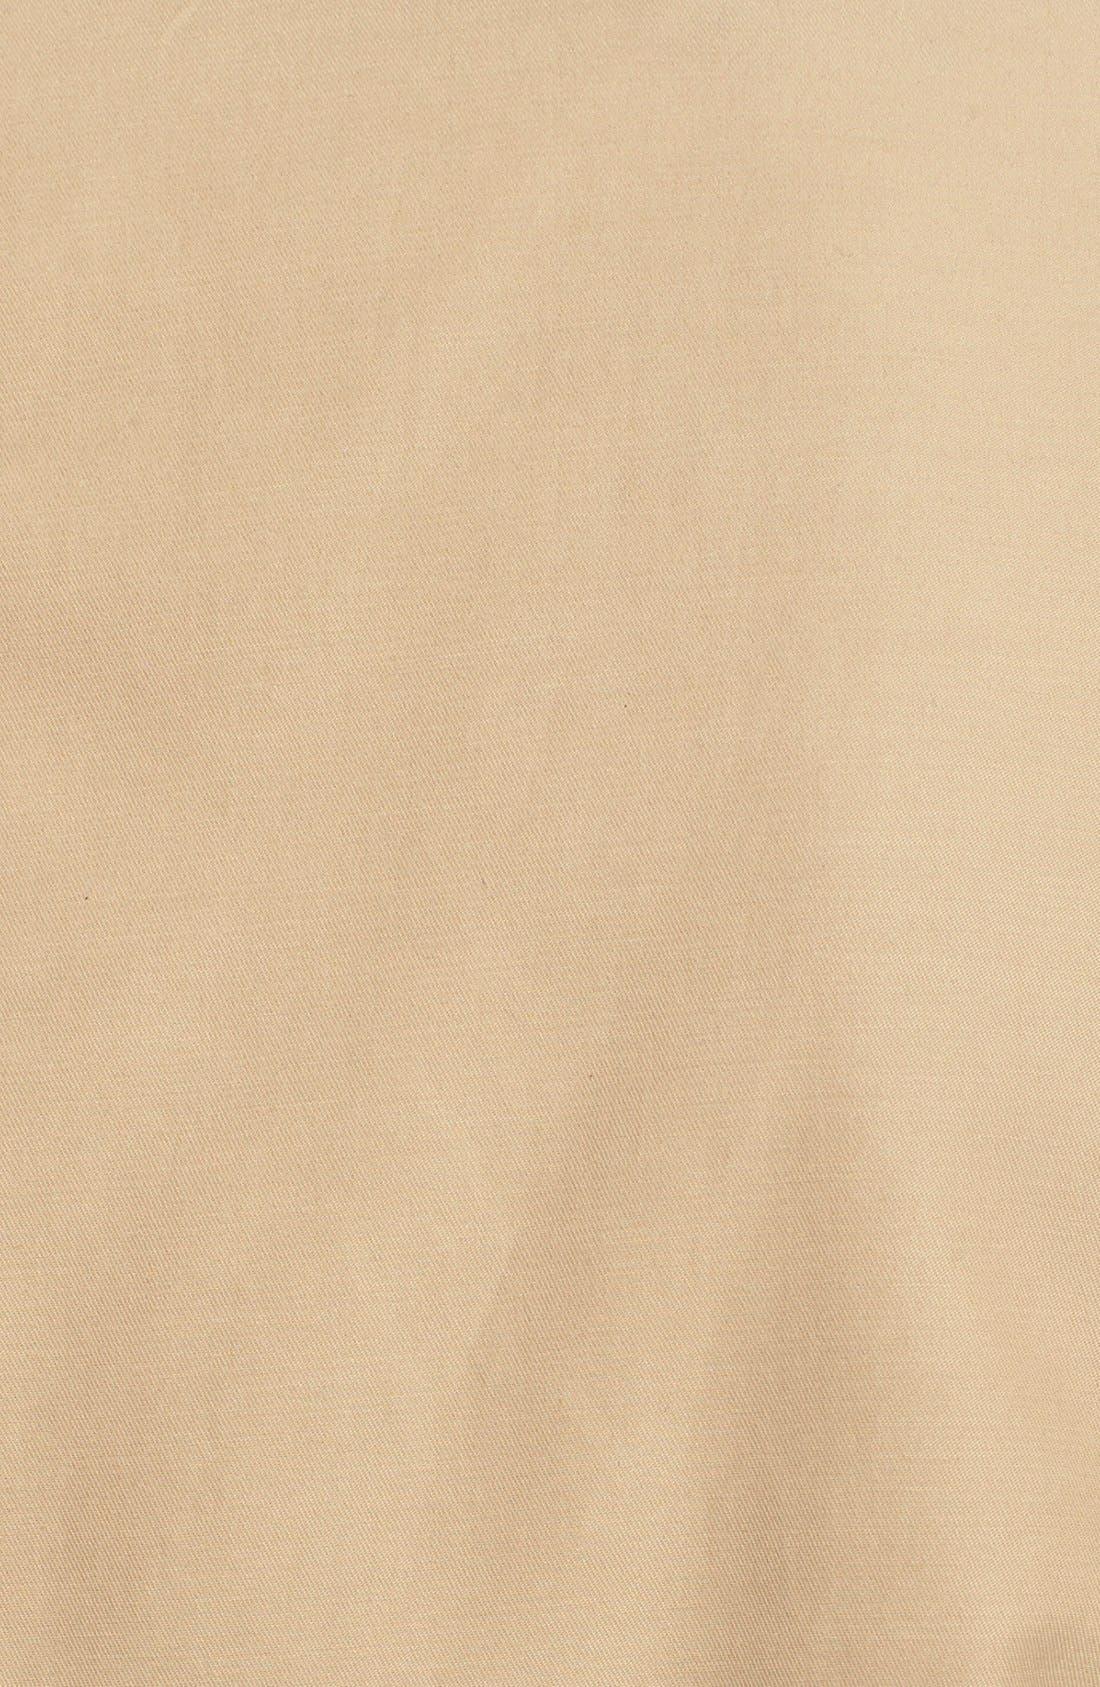 COLE HAAN,                             Cotton Blend Twill Car Coat,                             Alternate thumbnail 2, color,                             258